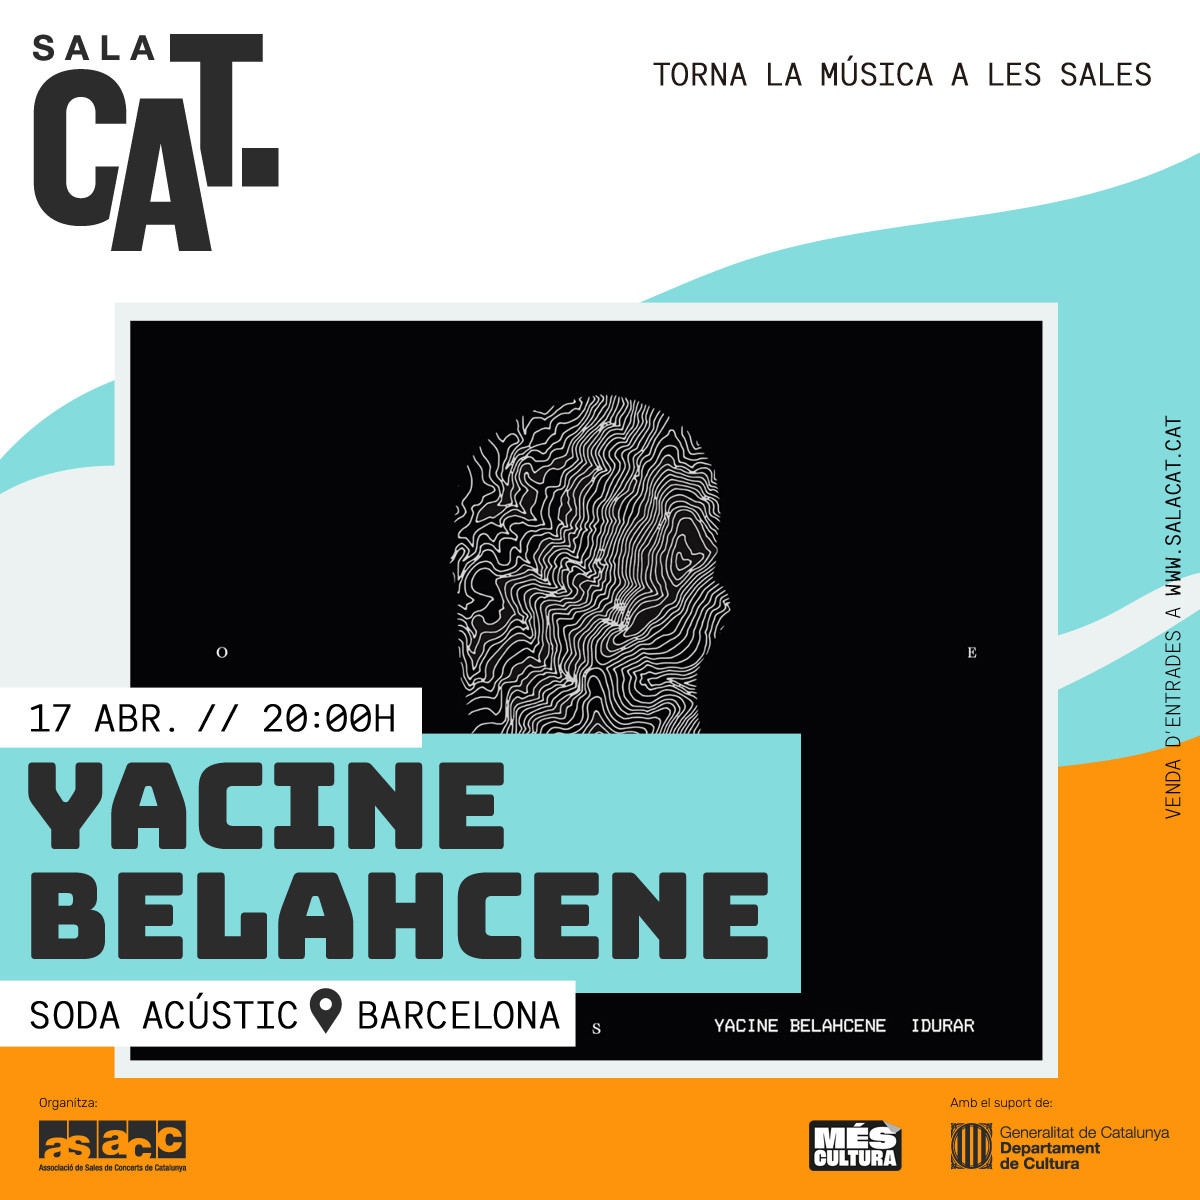 Yacine Belahcene-Soda-IG